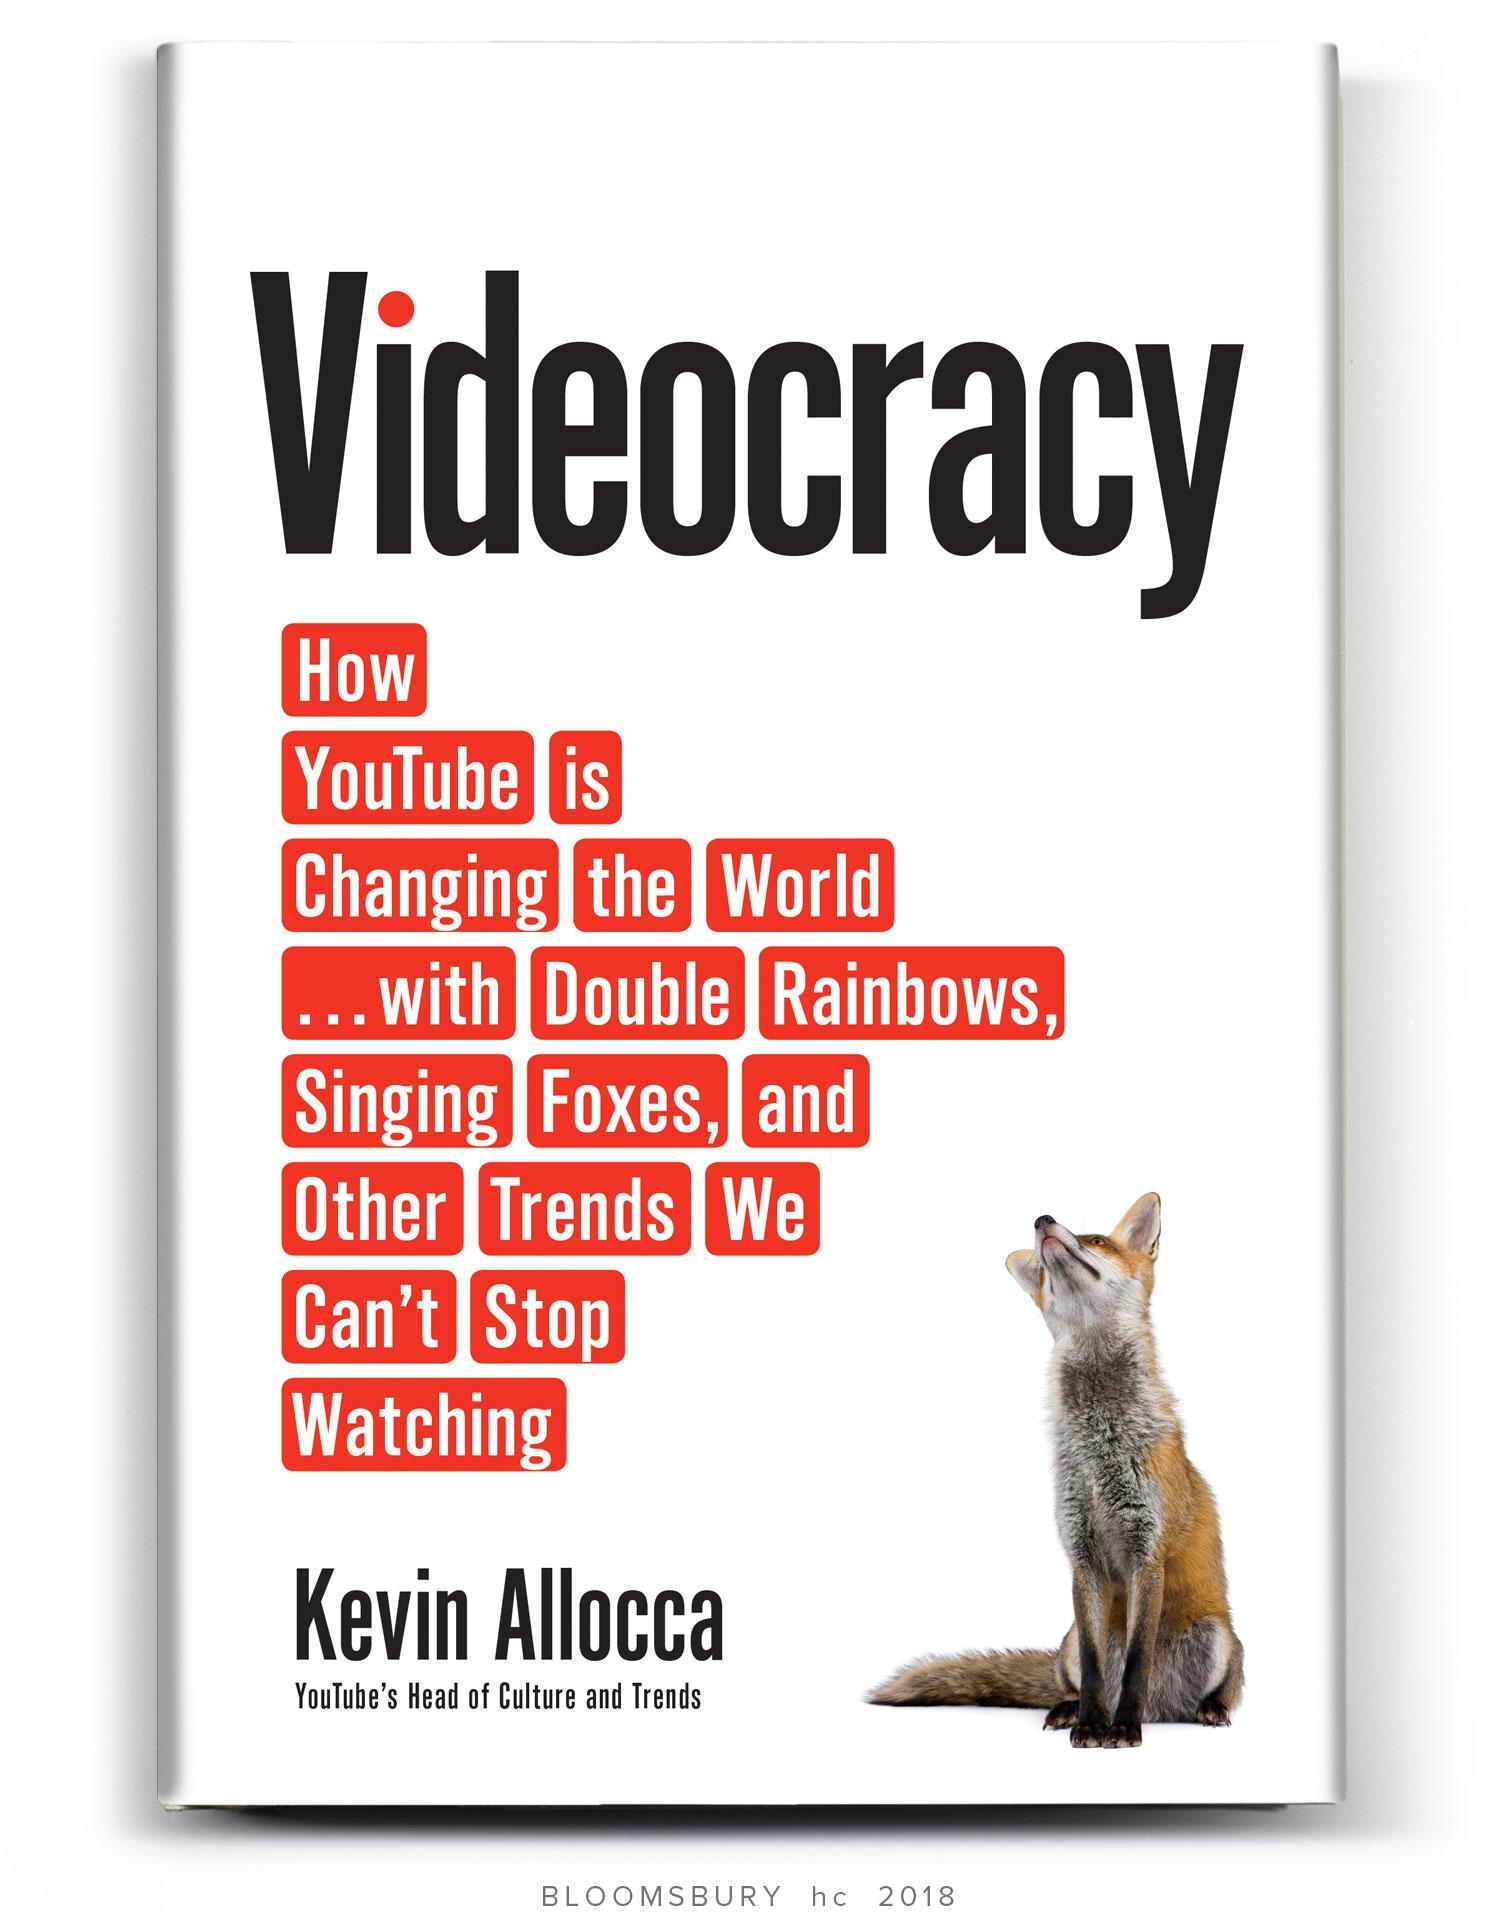 VIDEOCRACY-hc-template-ss6v2.jpg